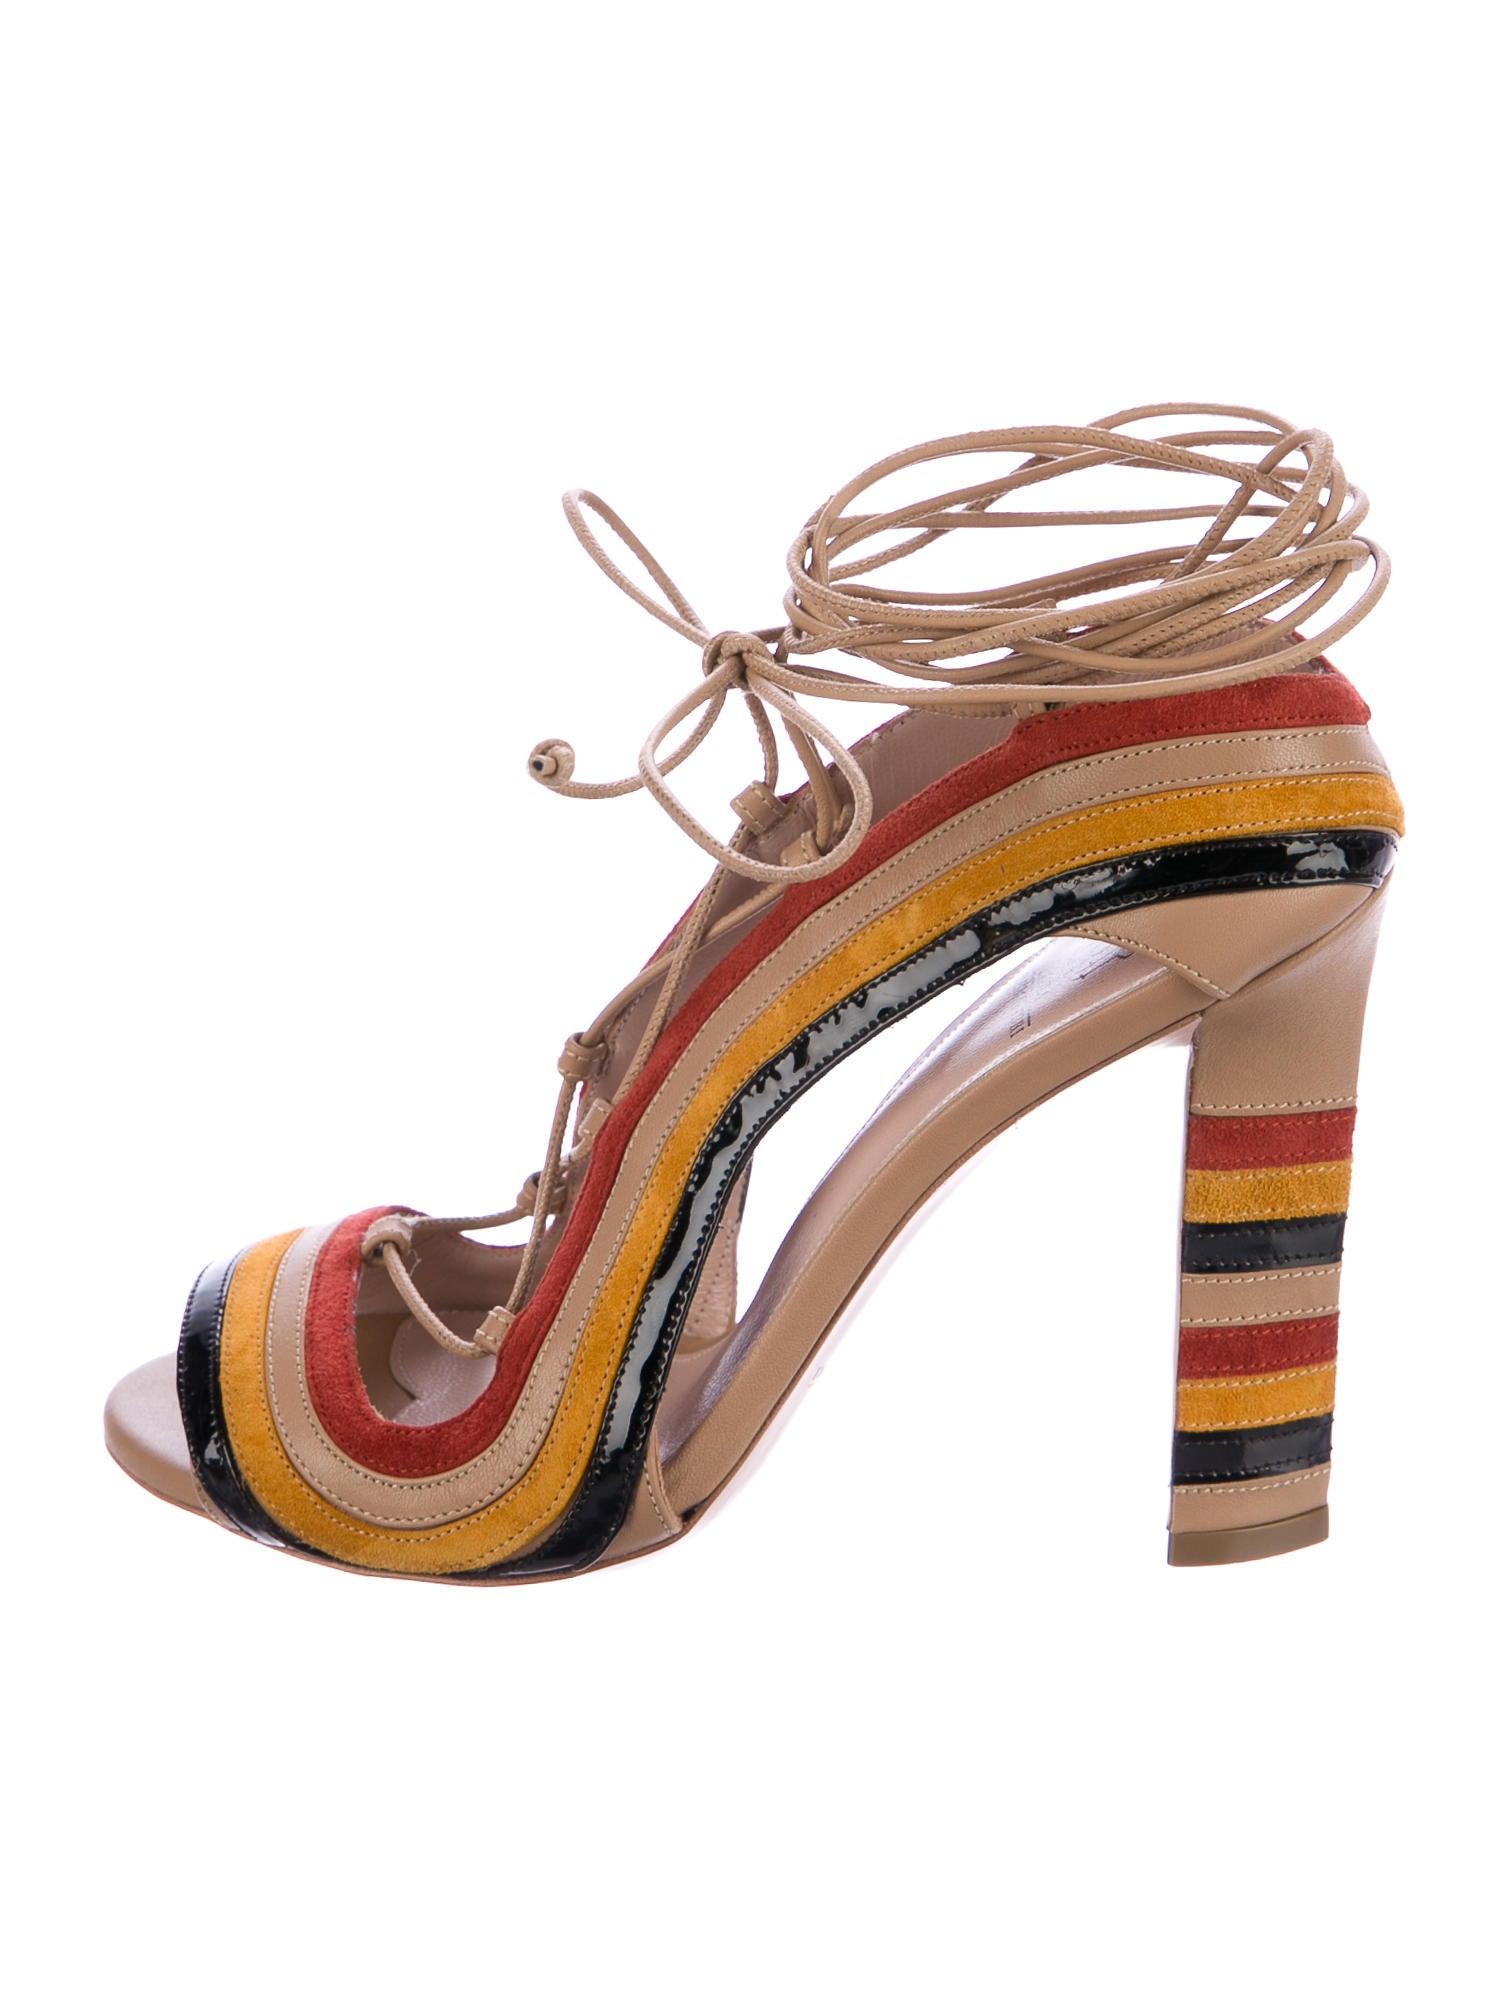 Paula Cademartori Leather Slide Sandals find great cheap price cheap discount sale perfect online buy cheap footlocker bWBcB